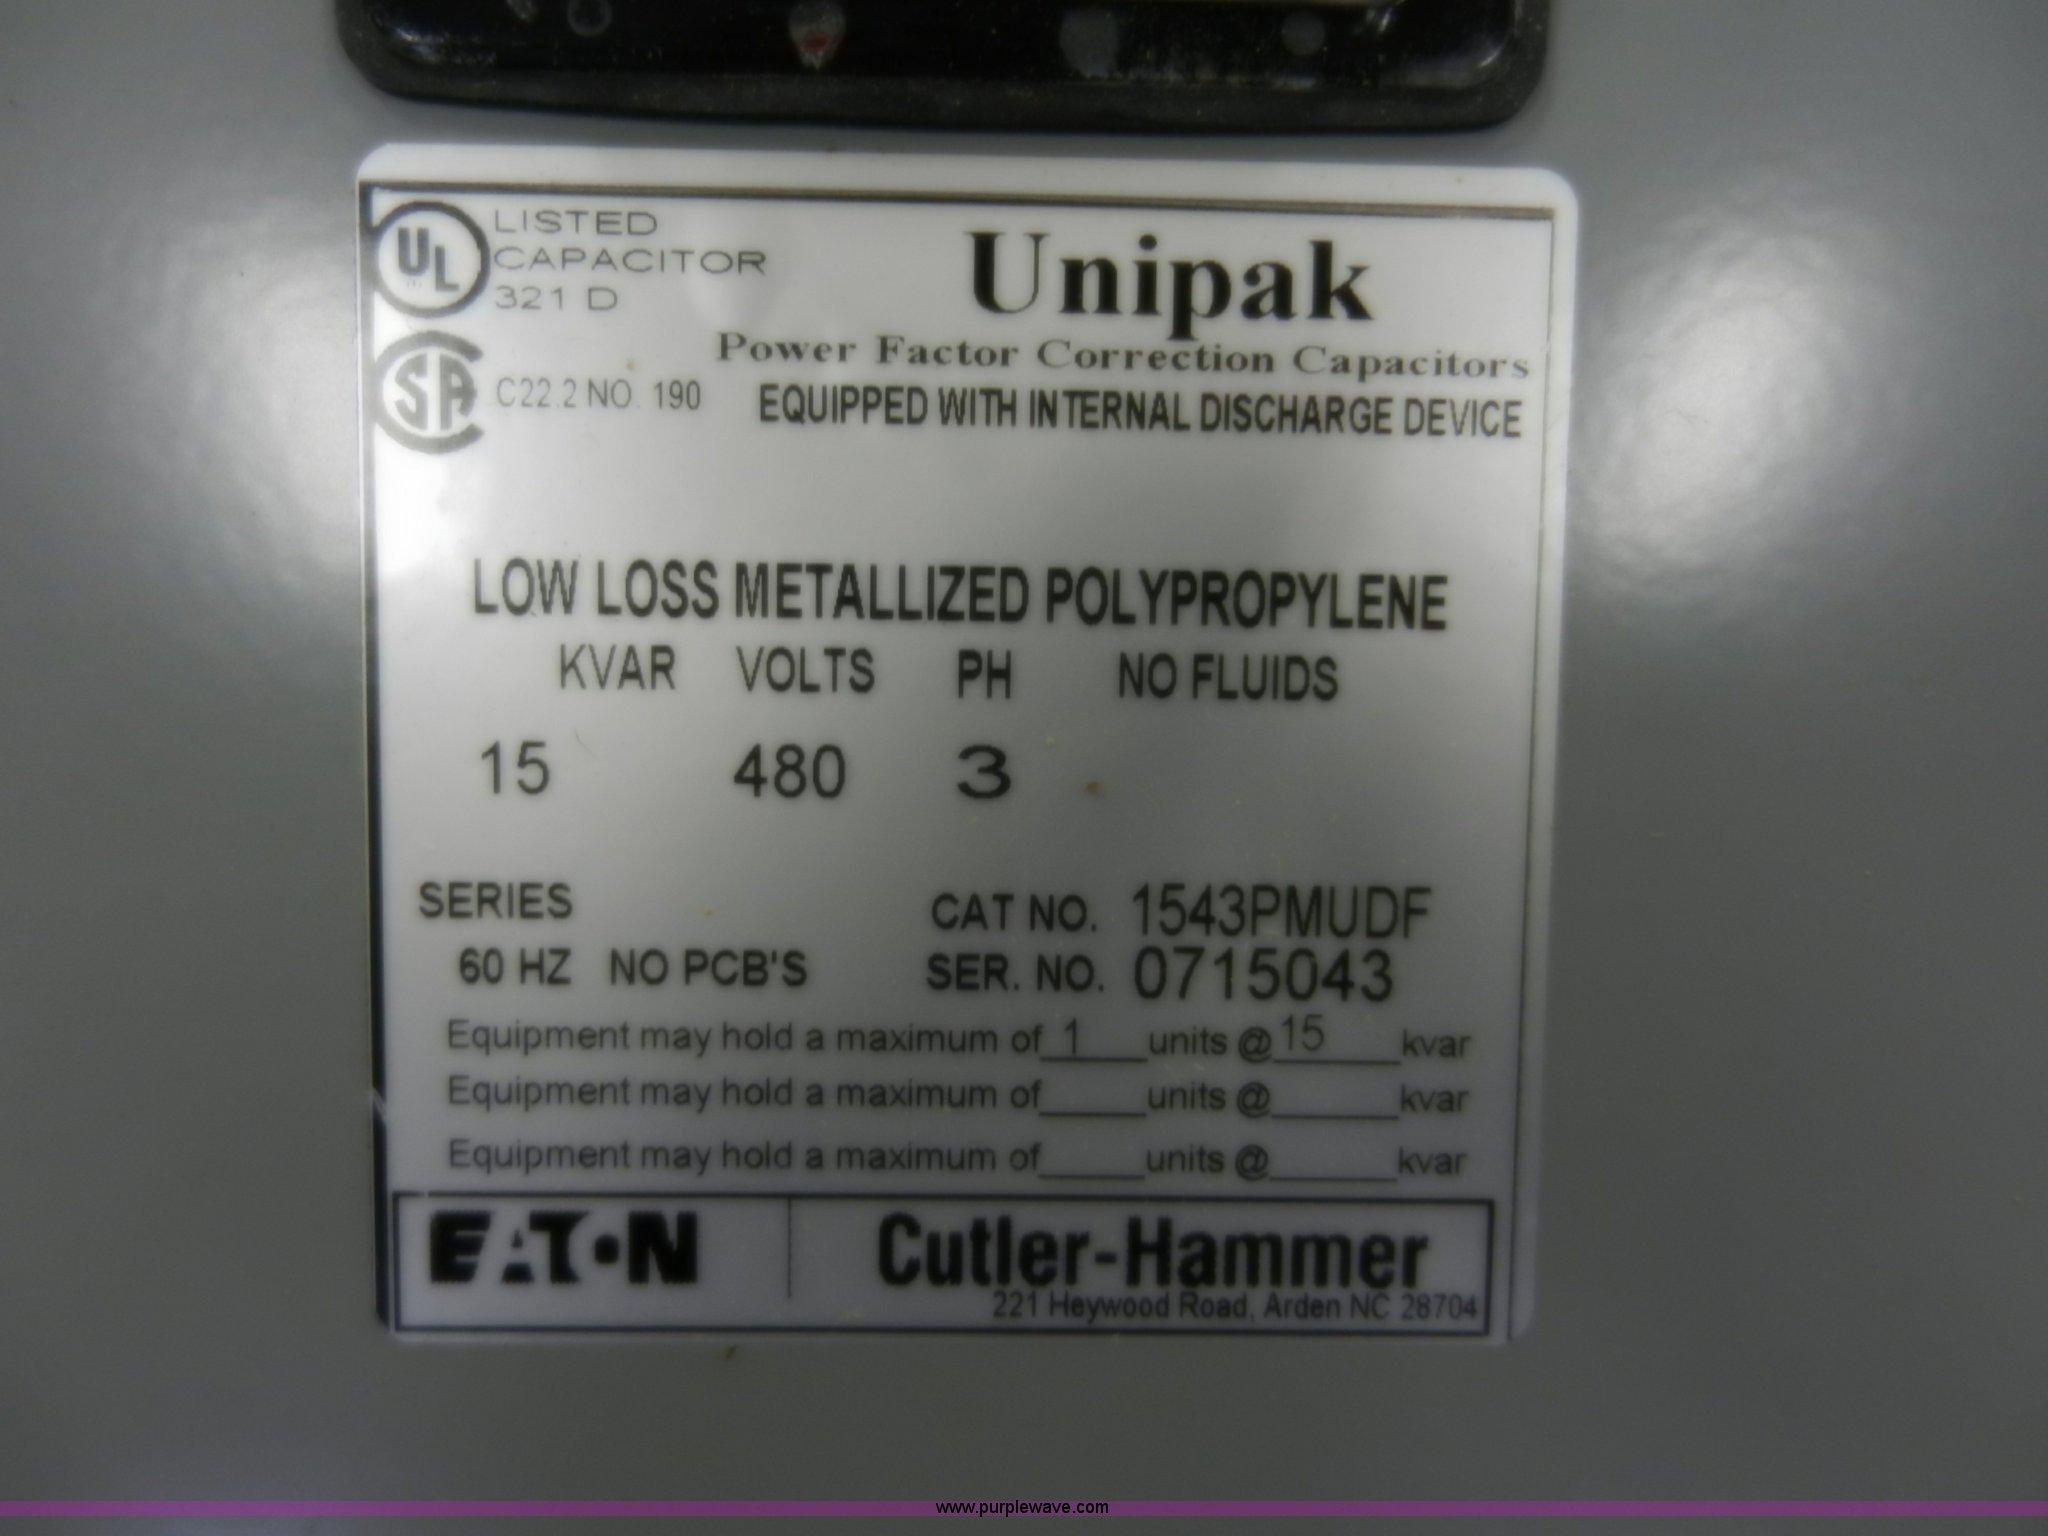 8 Unused Power Factor Capacitors Item X9784 Sold Mar Full Size In New Window